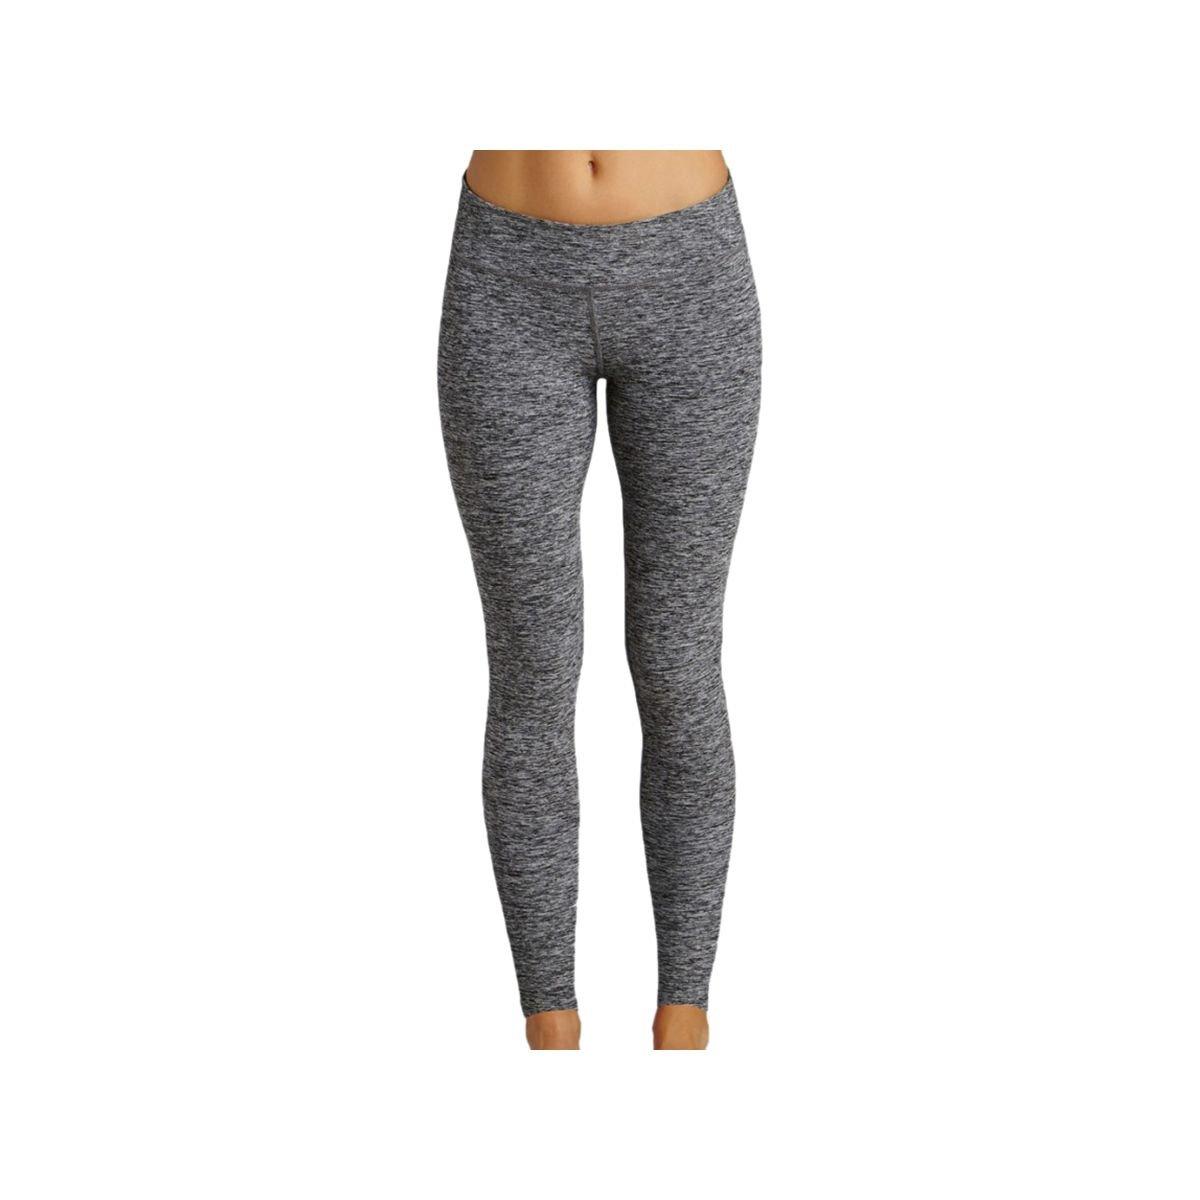 c96e78cacfbab Beyond Yoga Women's Spacedye Long Essential Leggings, Black Space Dye, XS  (US 2-4) X 28 at Amazon Women's Clothing store: